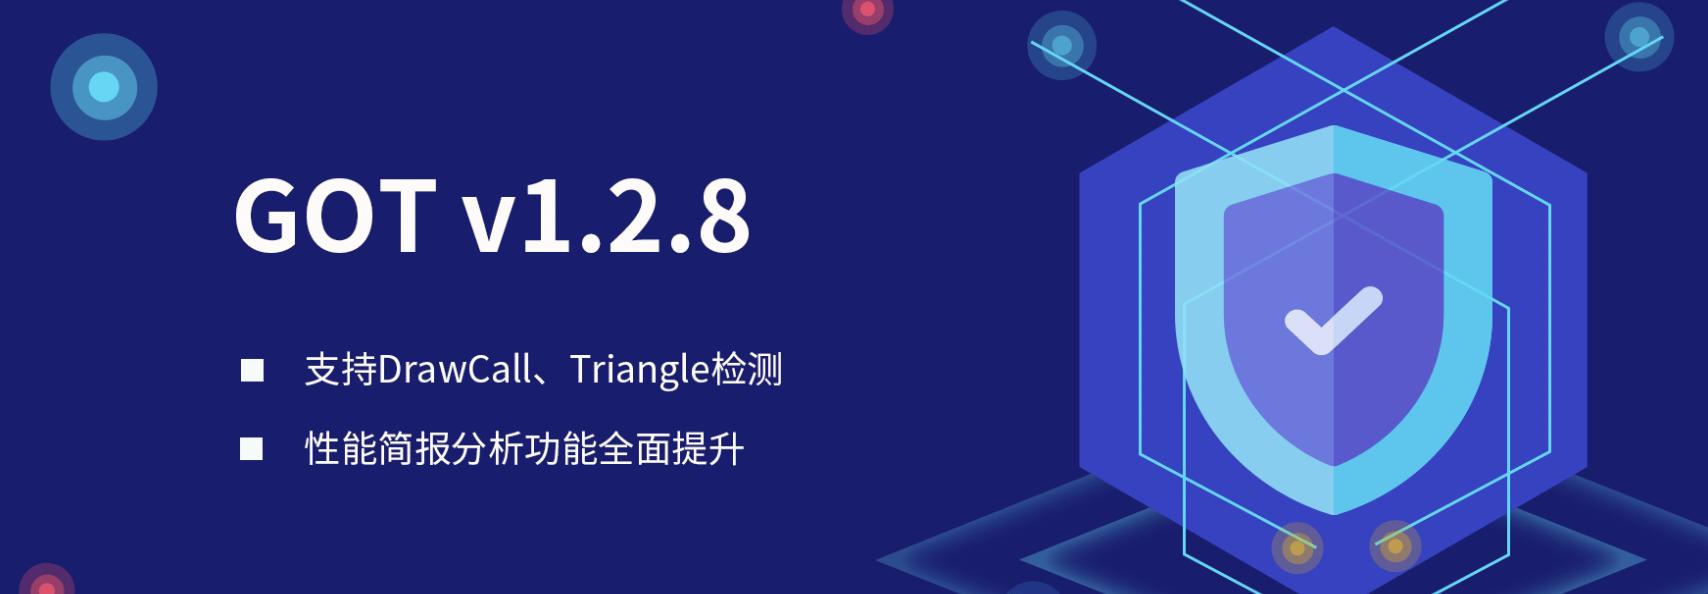 New | GOT Online 支持Draw Call、Triangle检测,性能简报分析功能全面提升!